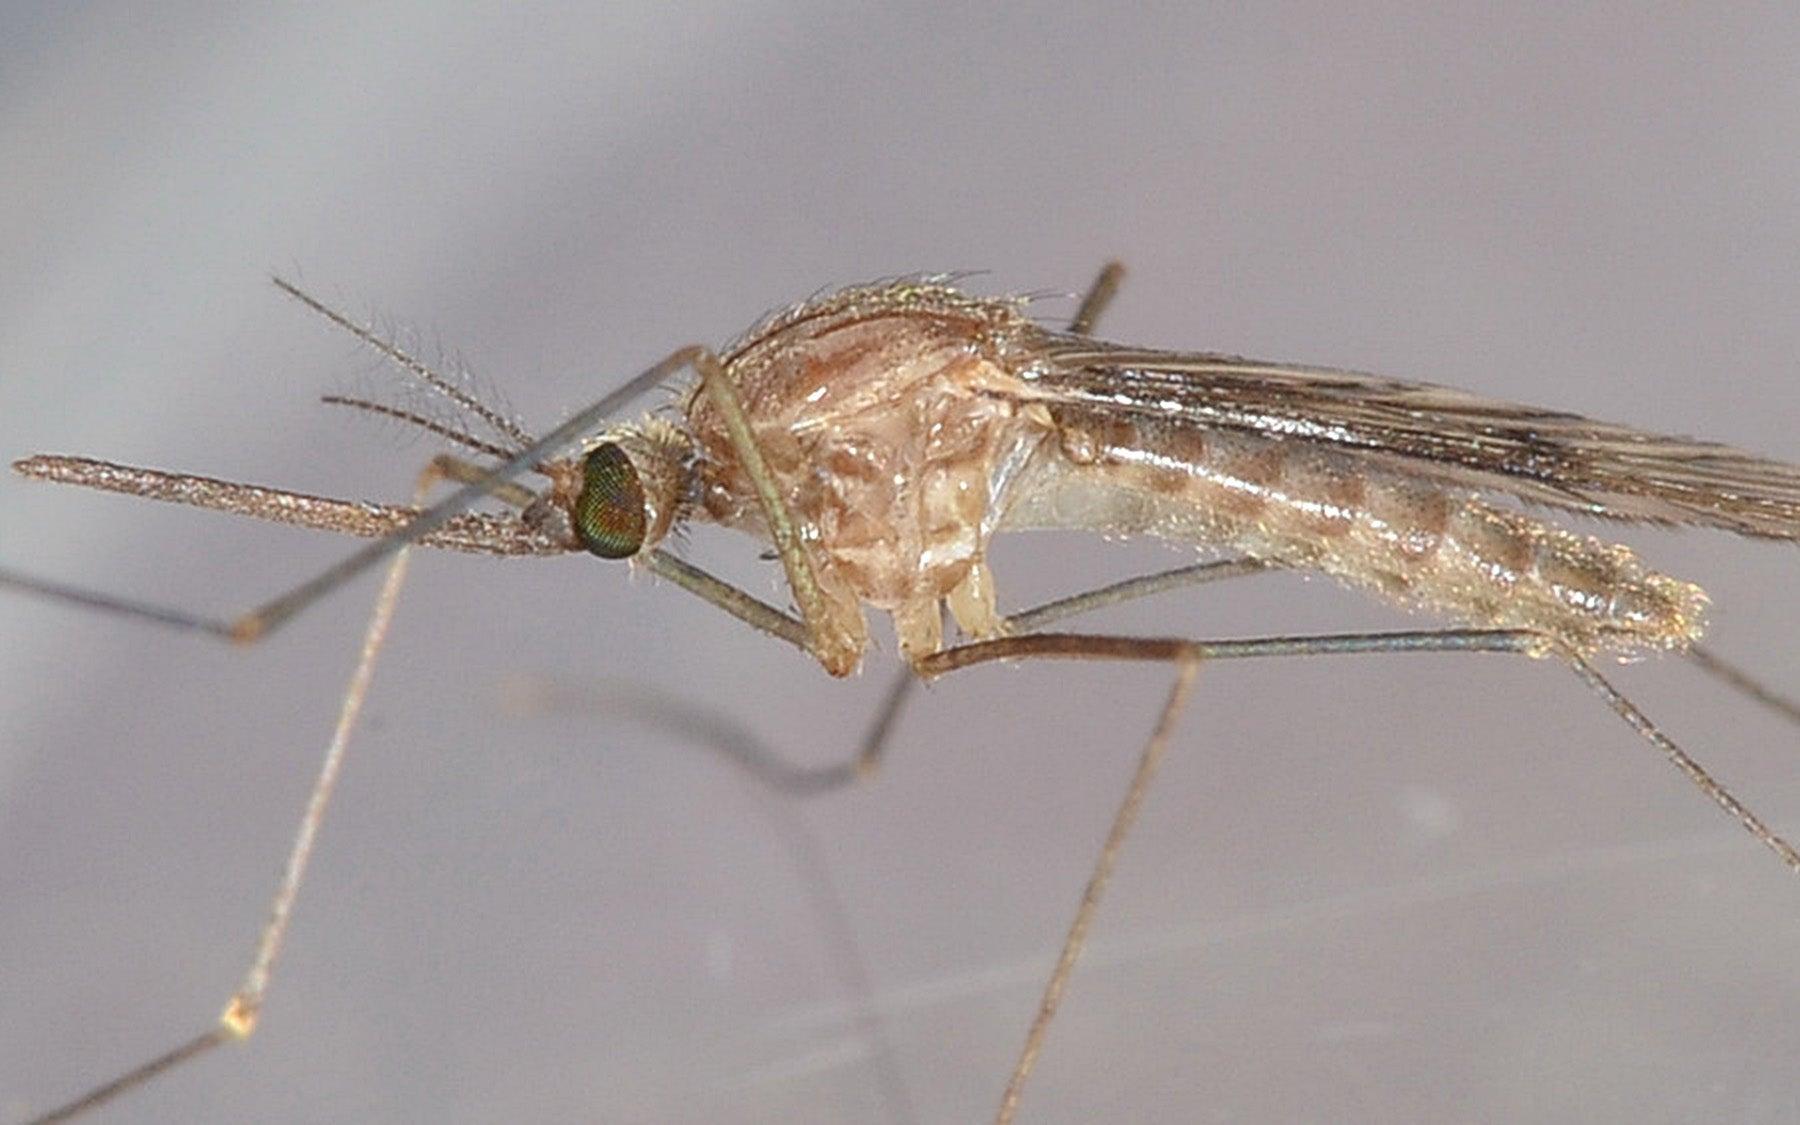 Anopheles freeborni mosquito